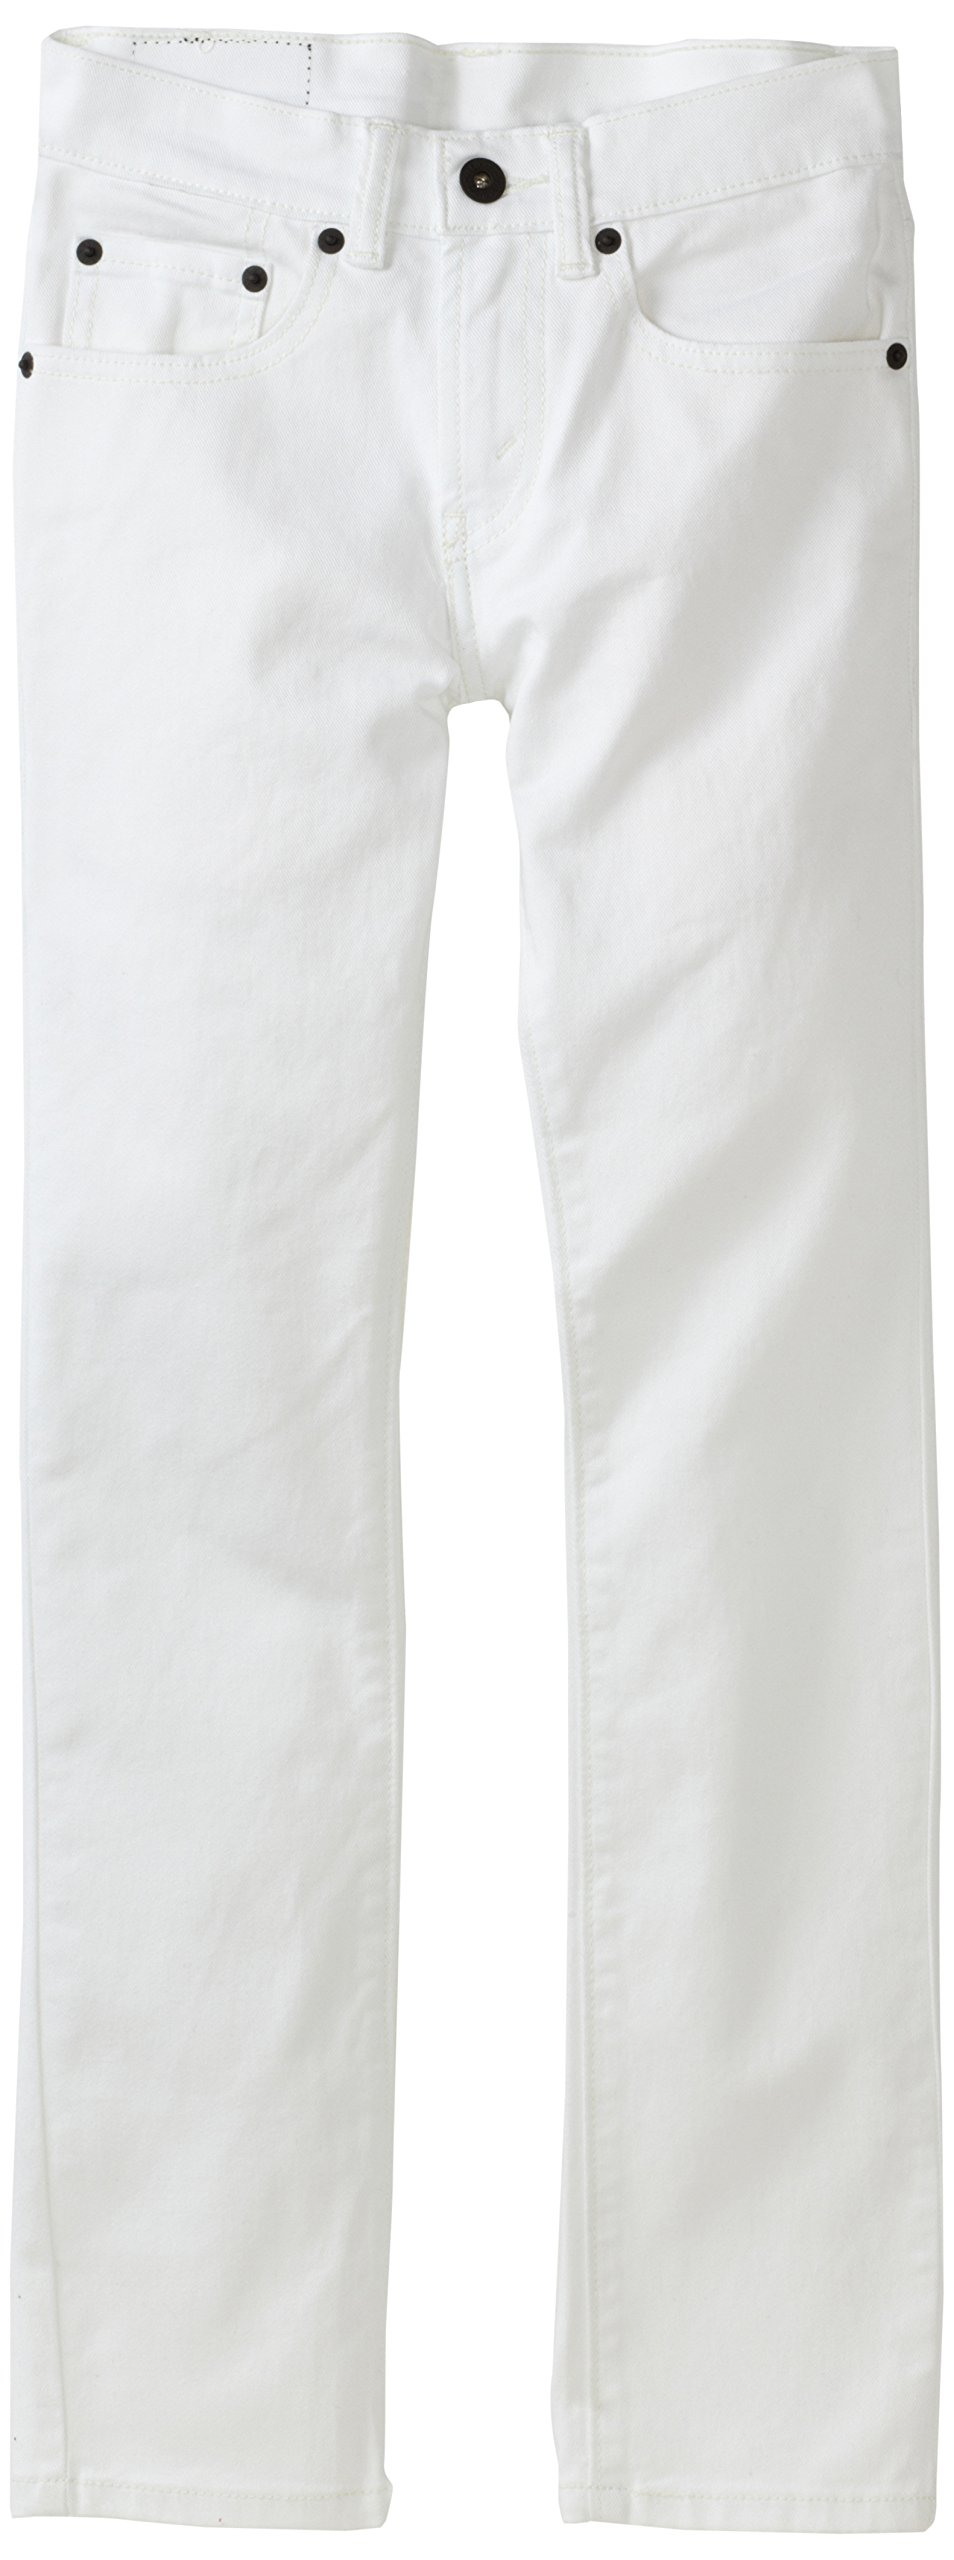 Levi's Boys' Big 510 Skinny Fit Jeans, White, 8